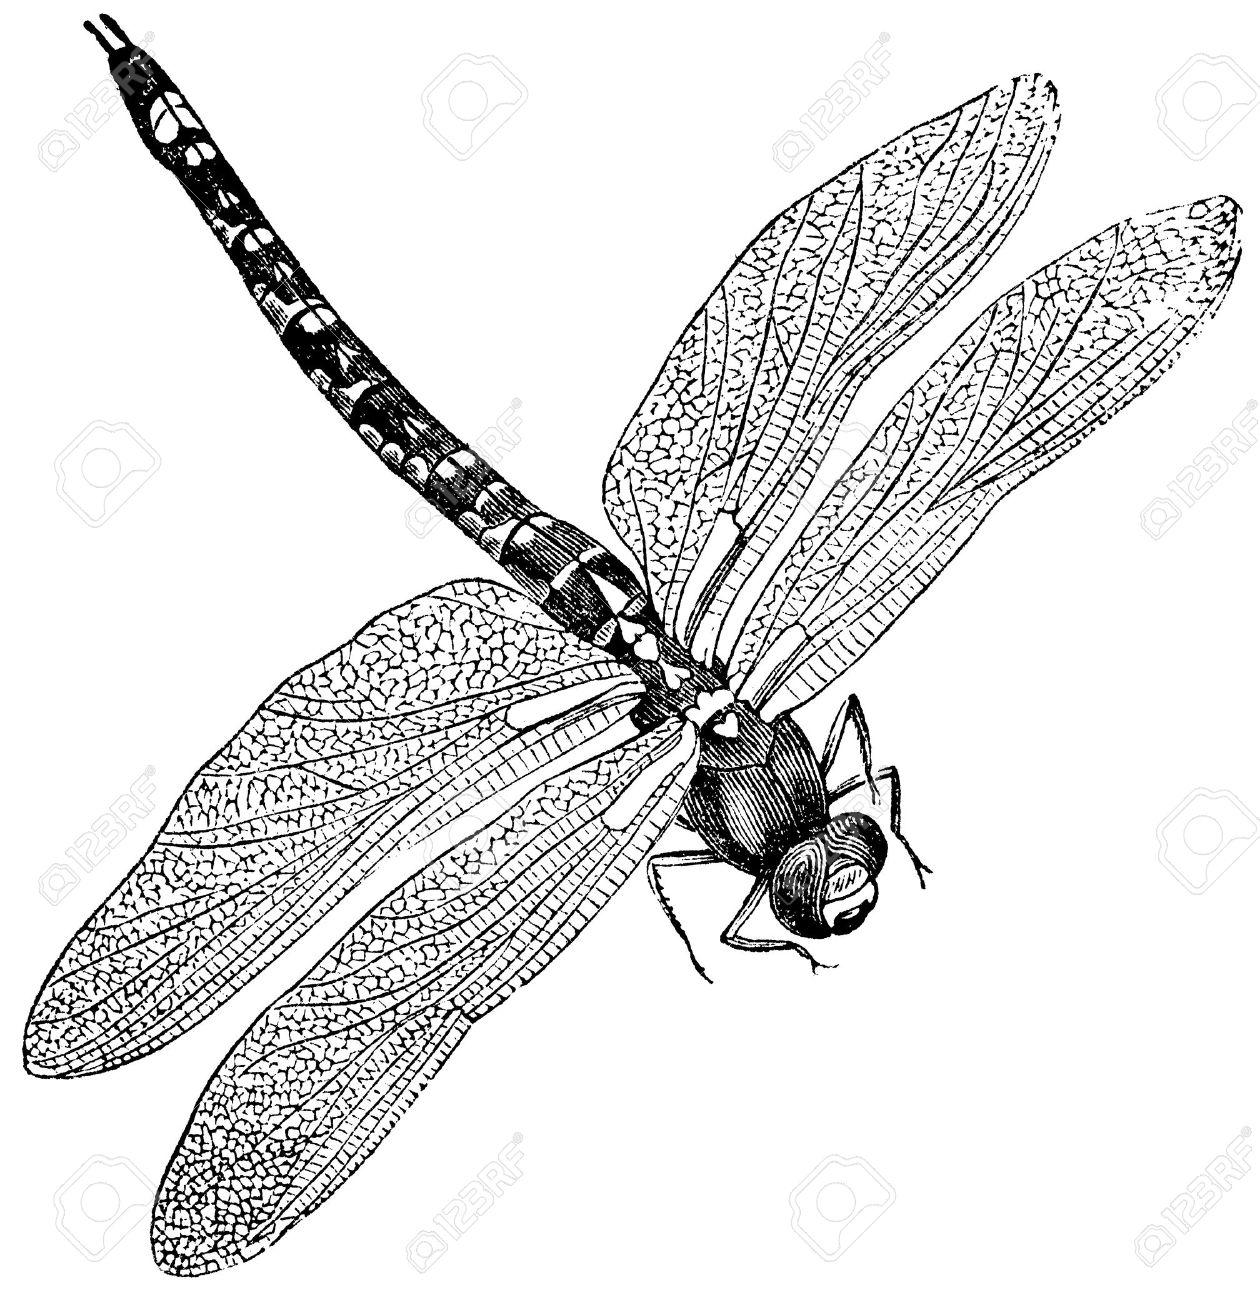 14128387-Vintage-engraved-illustration-of-a-dragonfly-isolated-against-white--Stock-Illustration.jpg